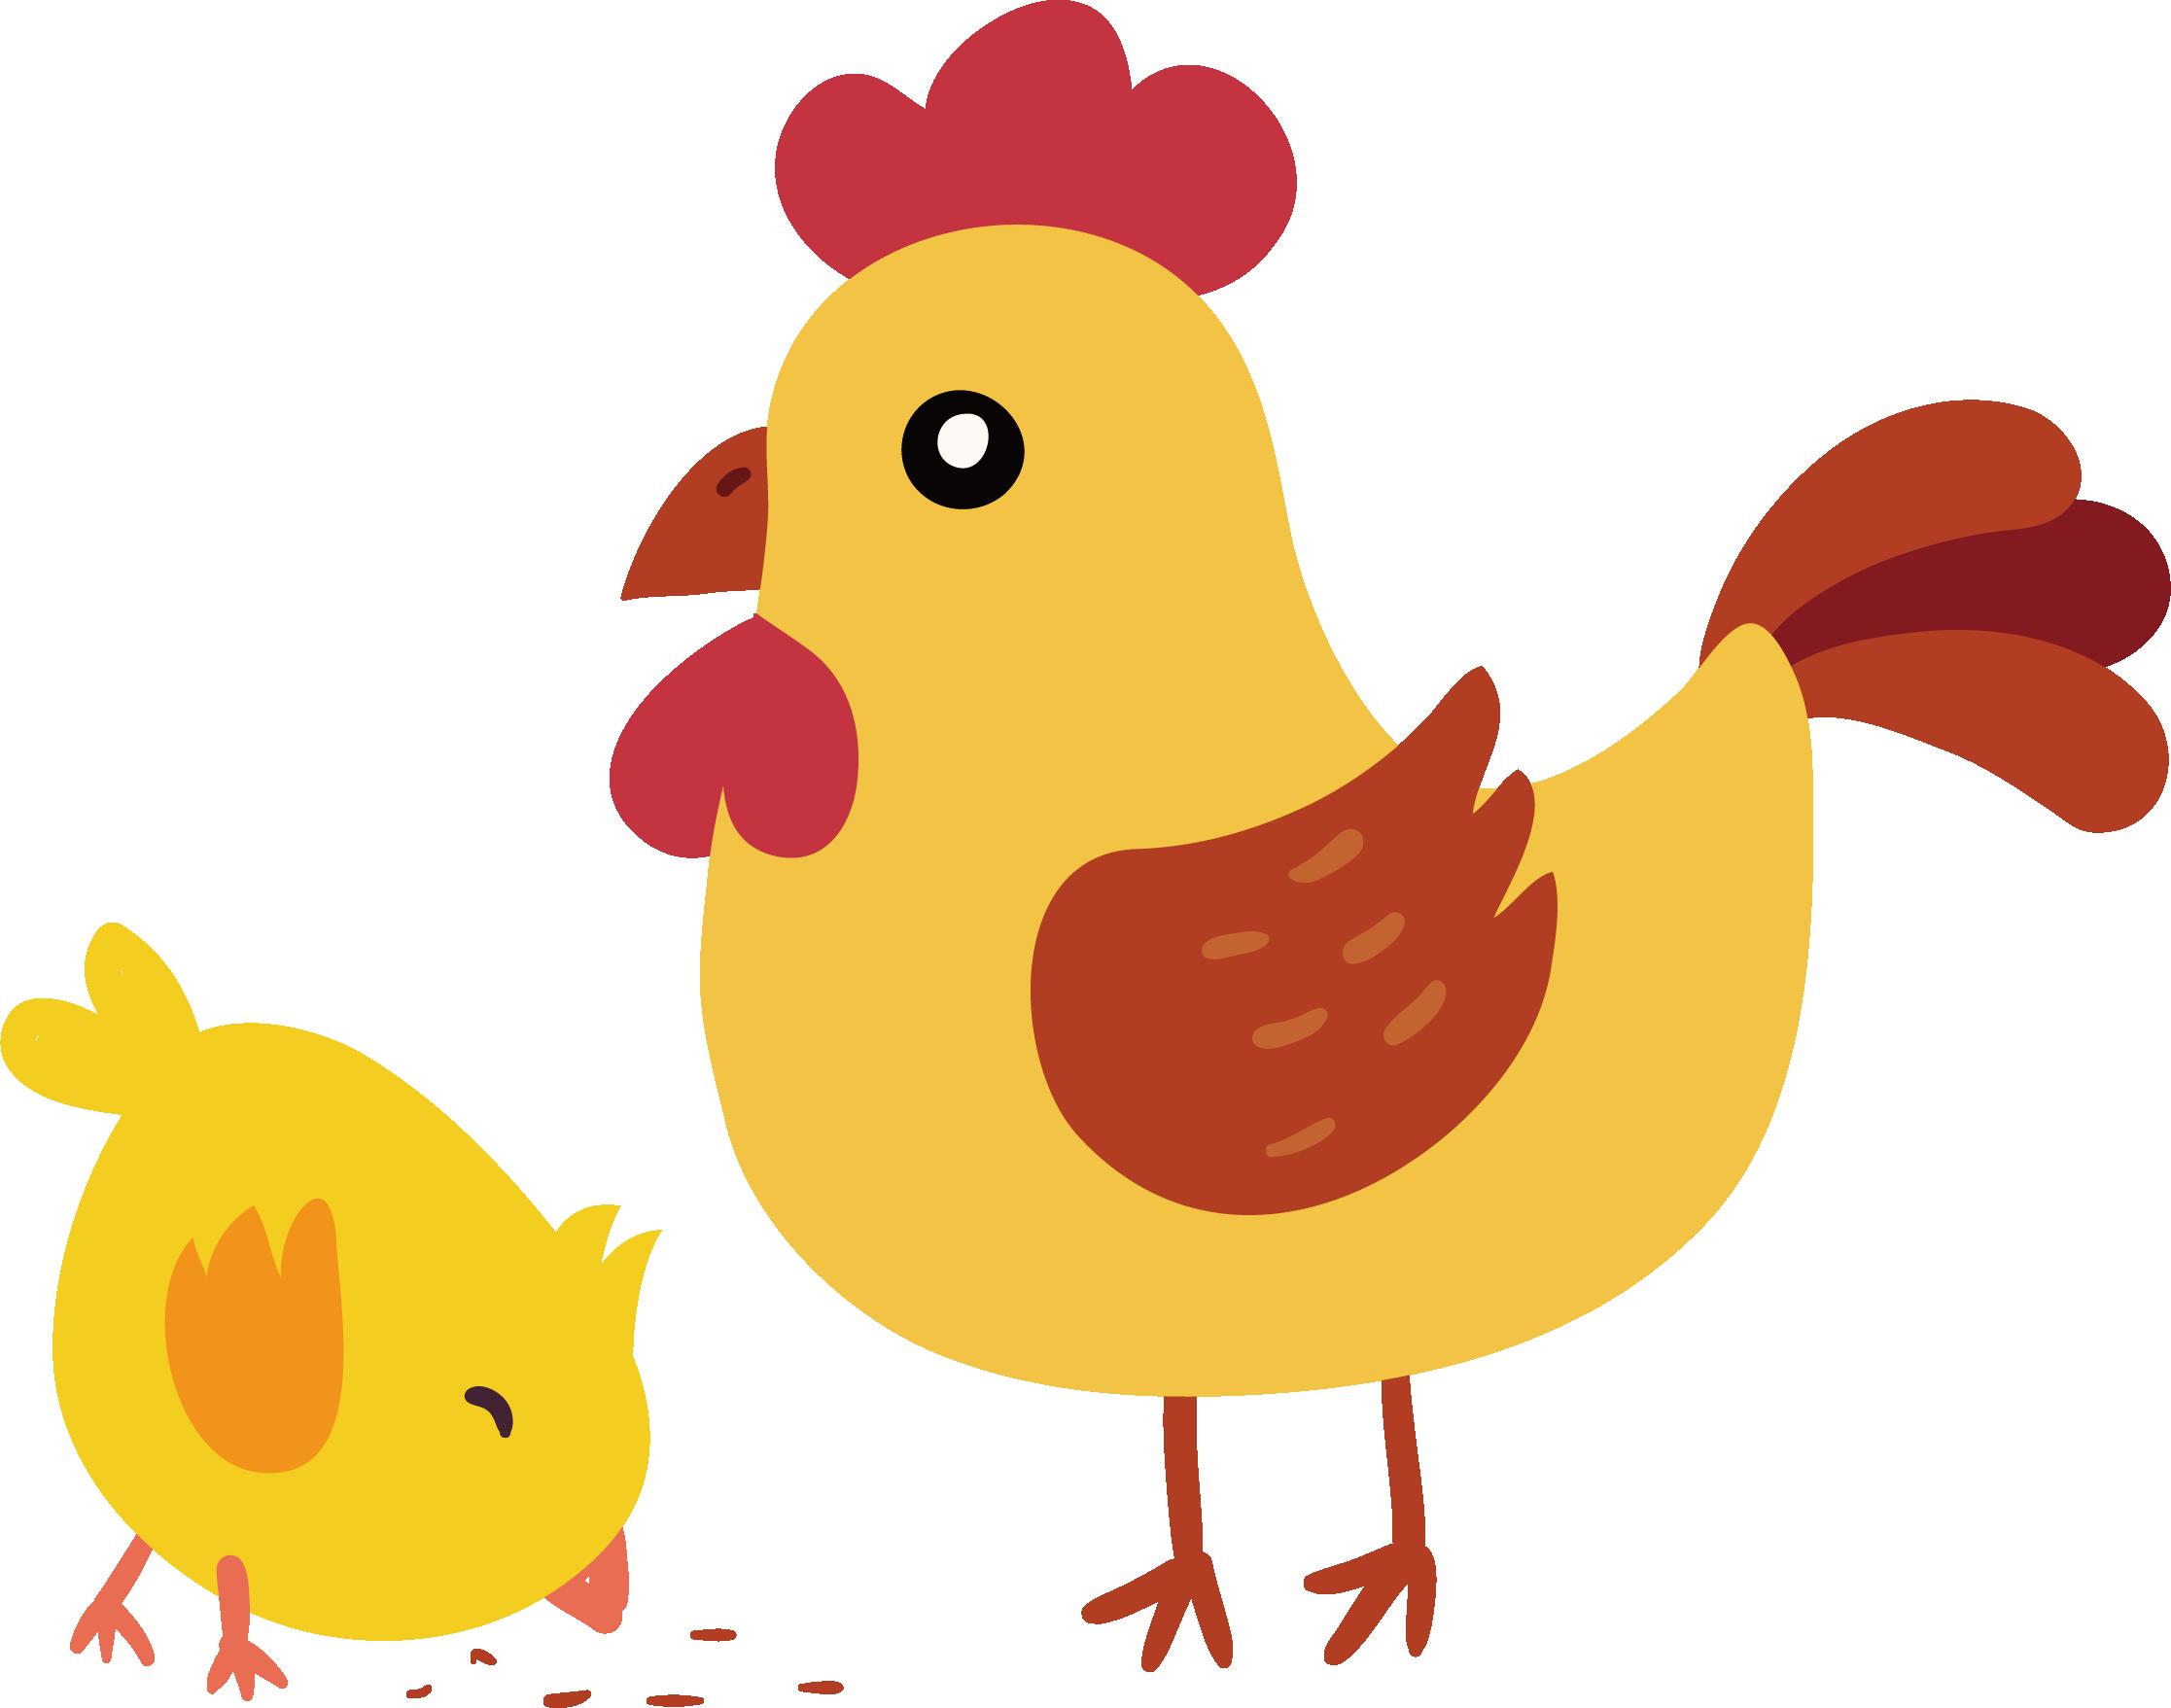 Hen clipart orange chicken. Yellow hair little euclidean